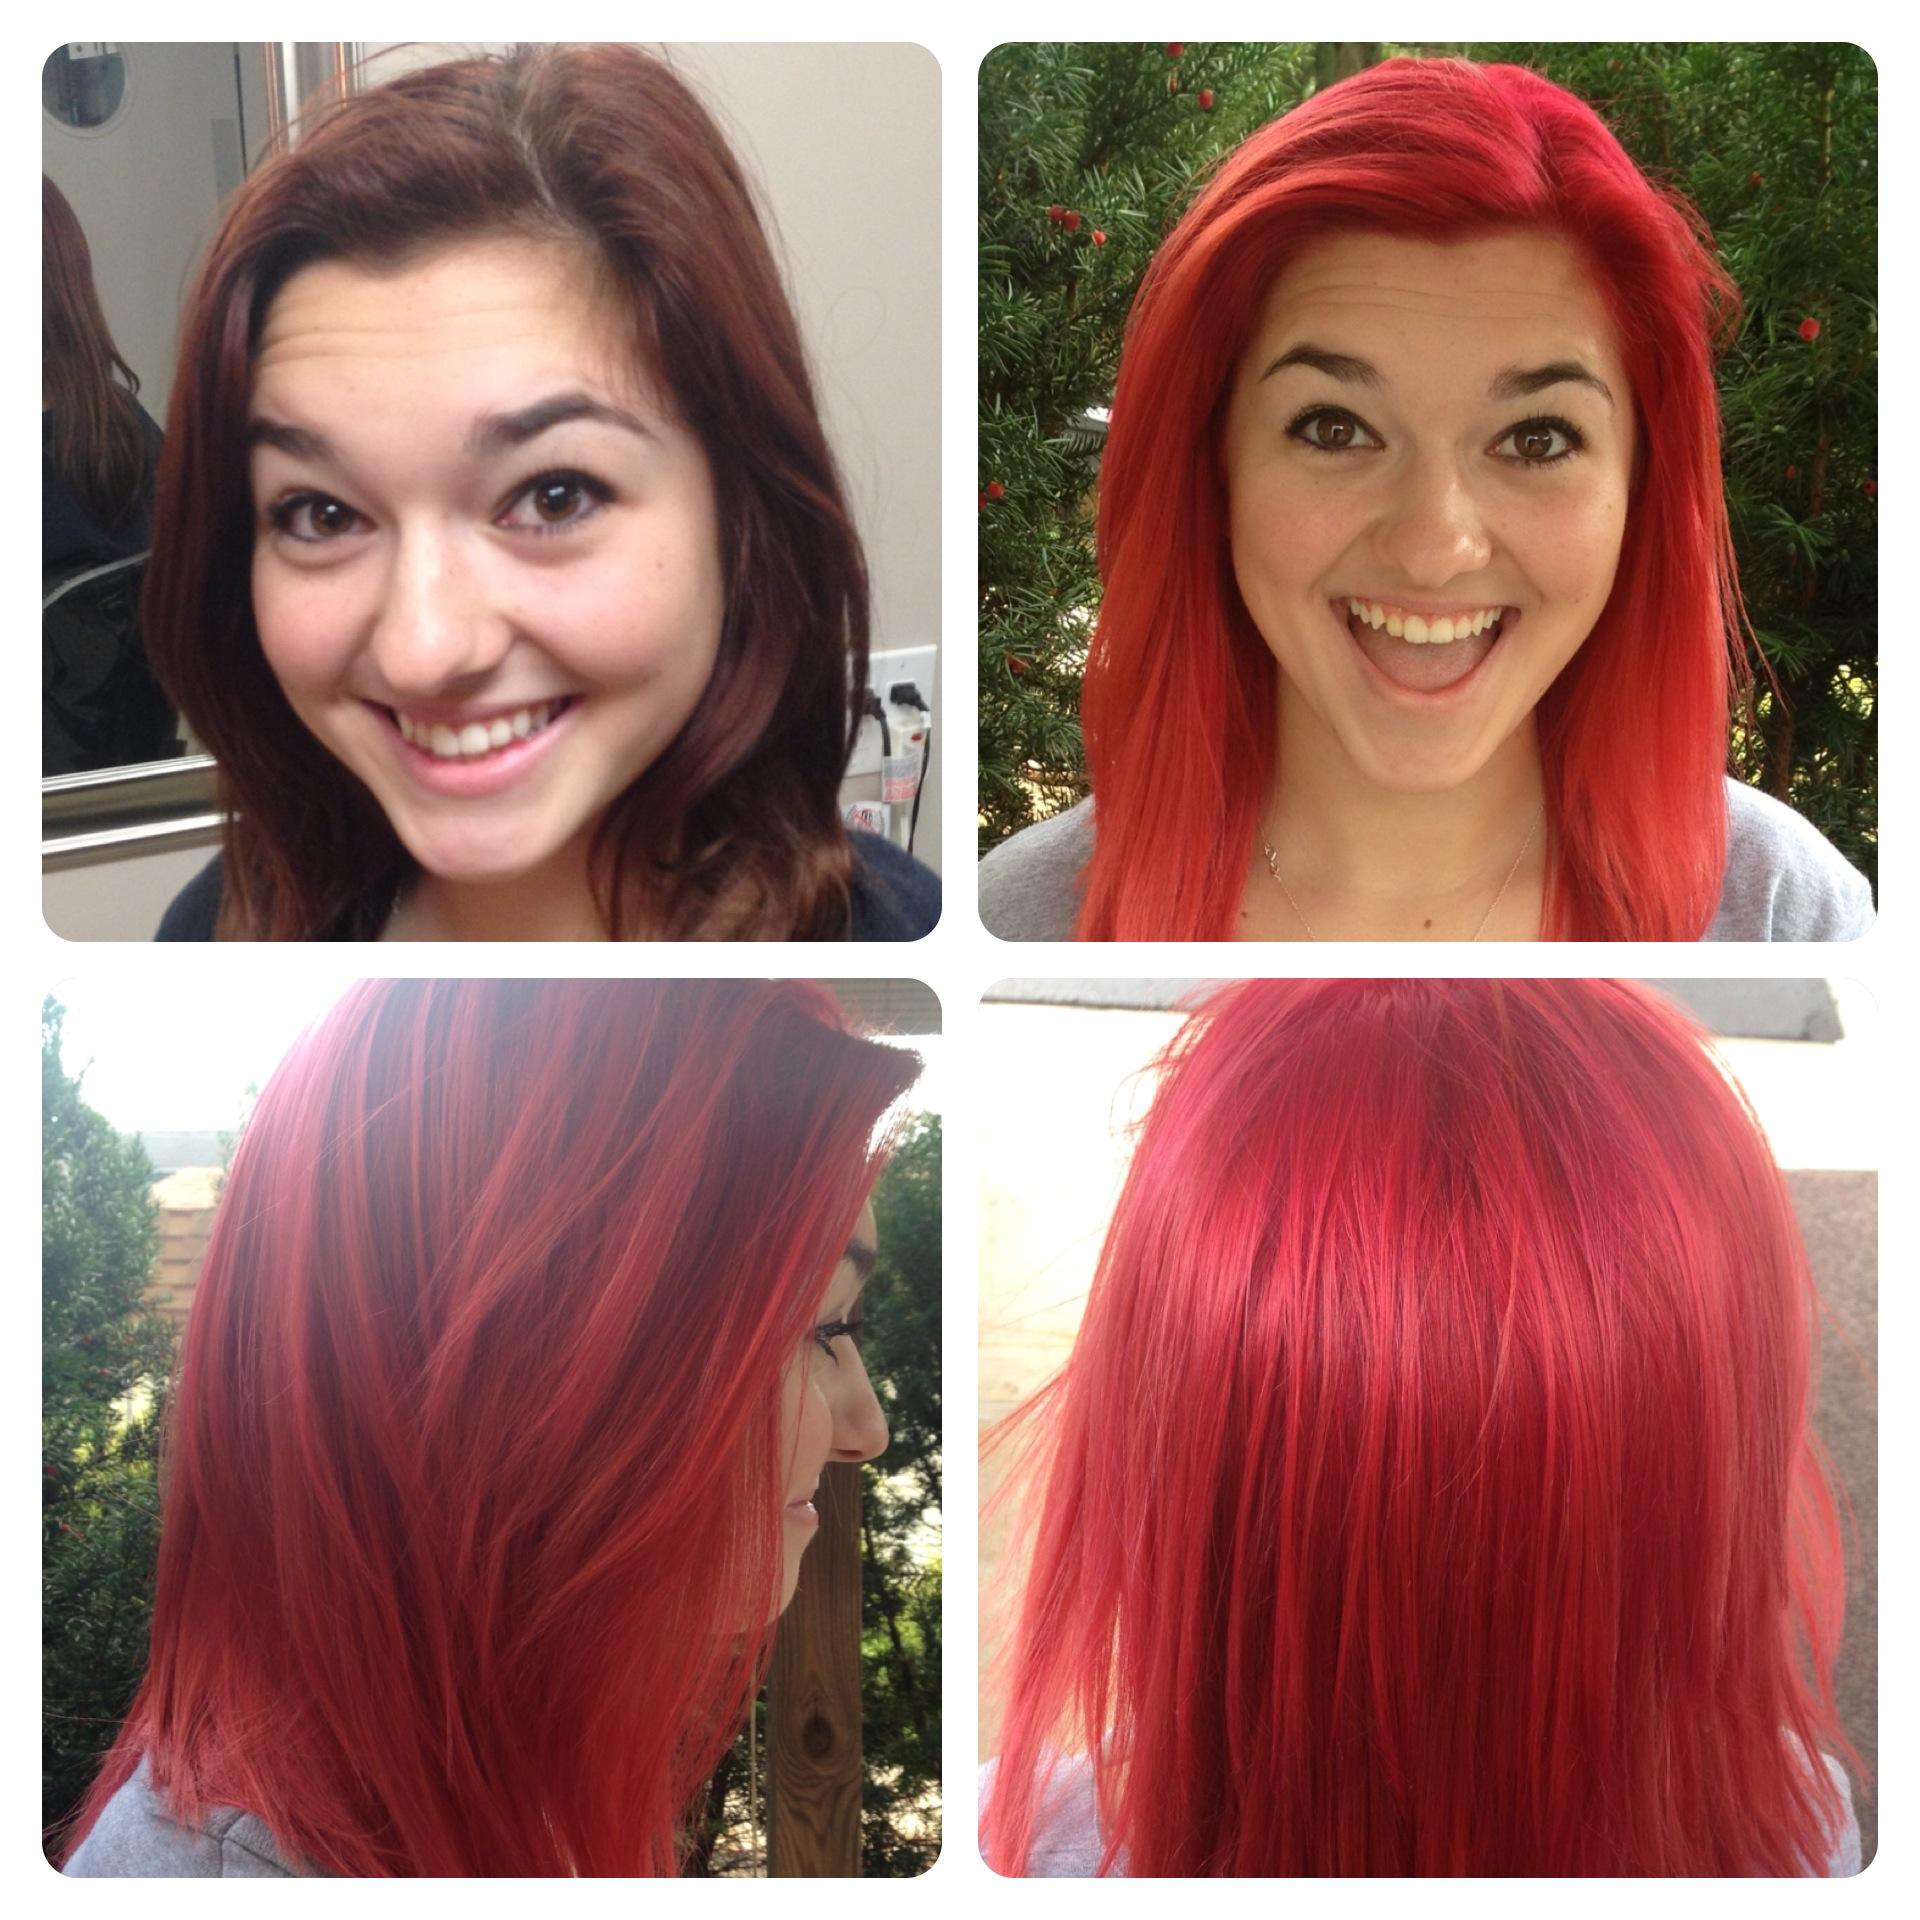 Do You Really Need a Shampoo for Color-Treated Hair? - Shear ...